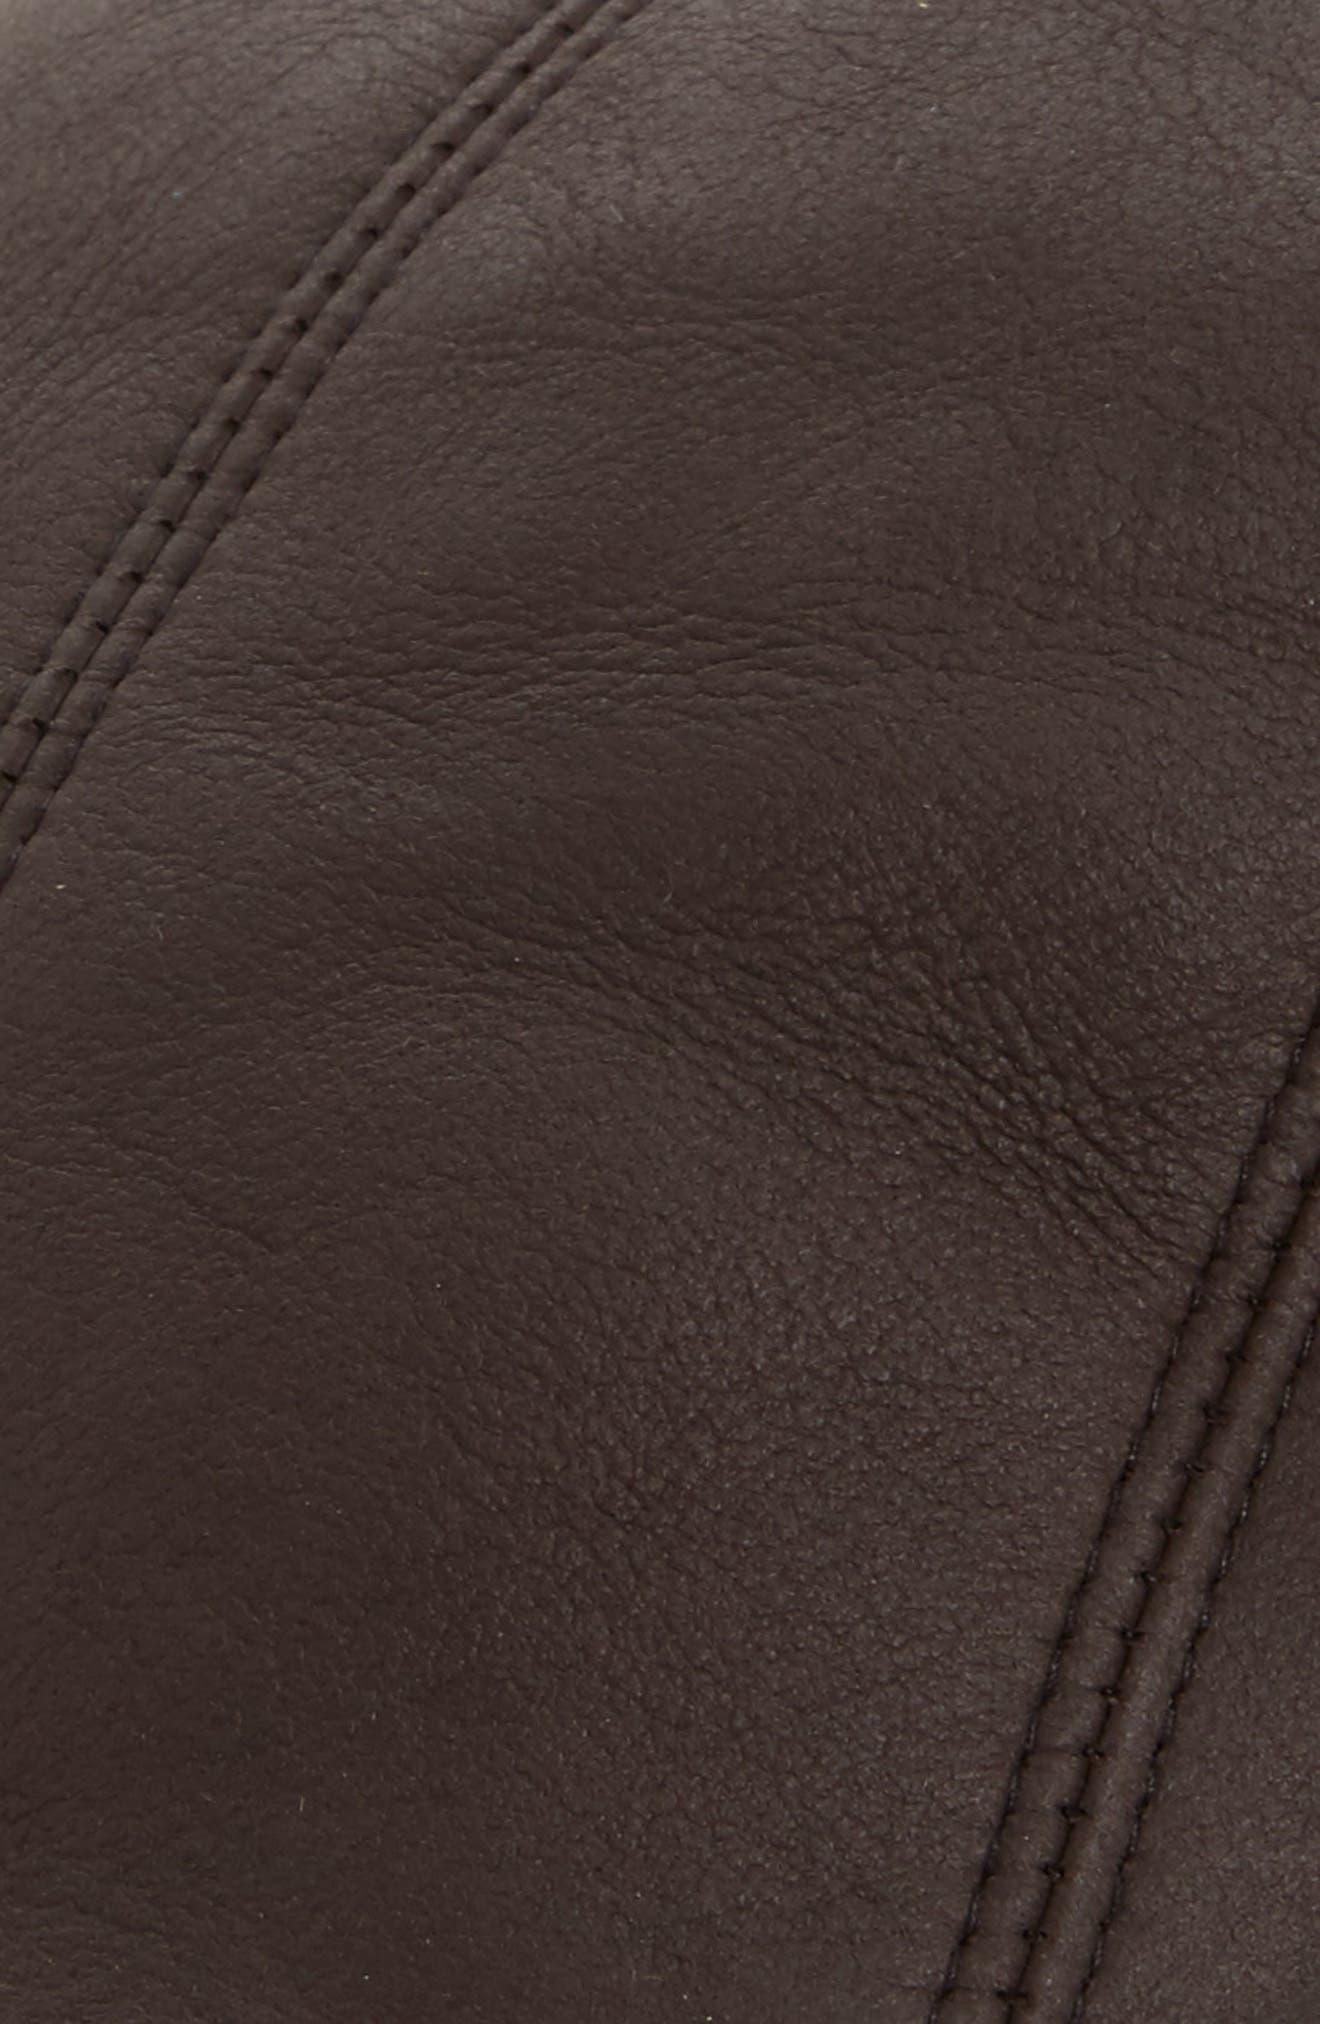 Alternate Image 2  - Crown Cap Genuine Shearling Leather Driving Cap